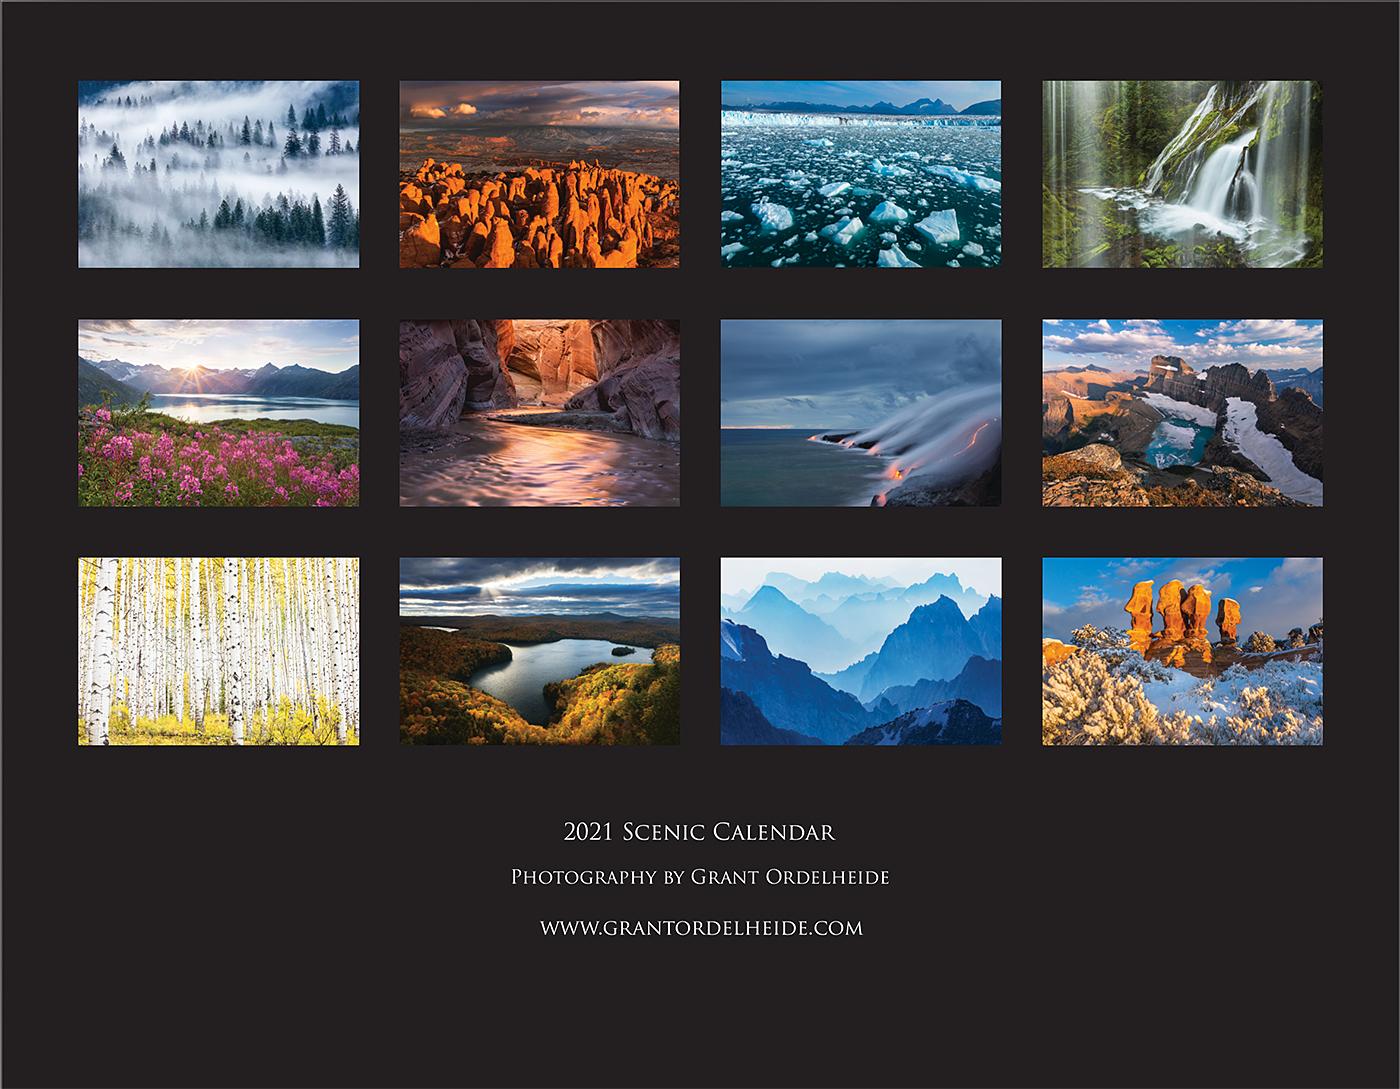 2021 Scenic Calendar